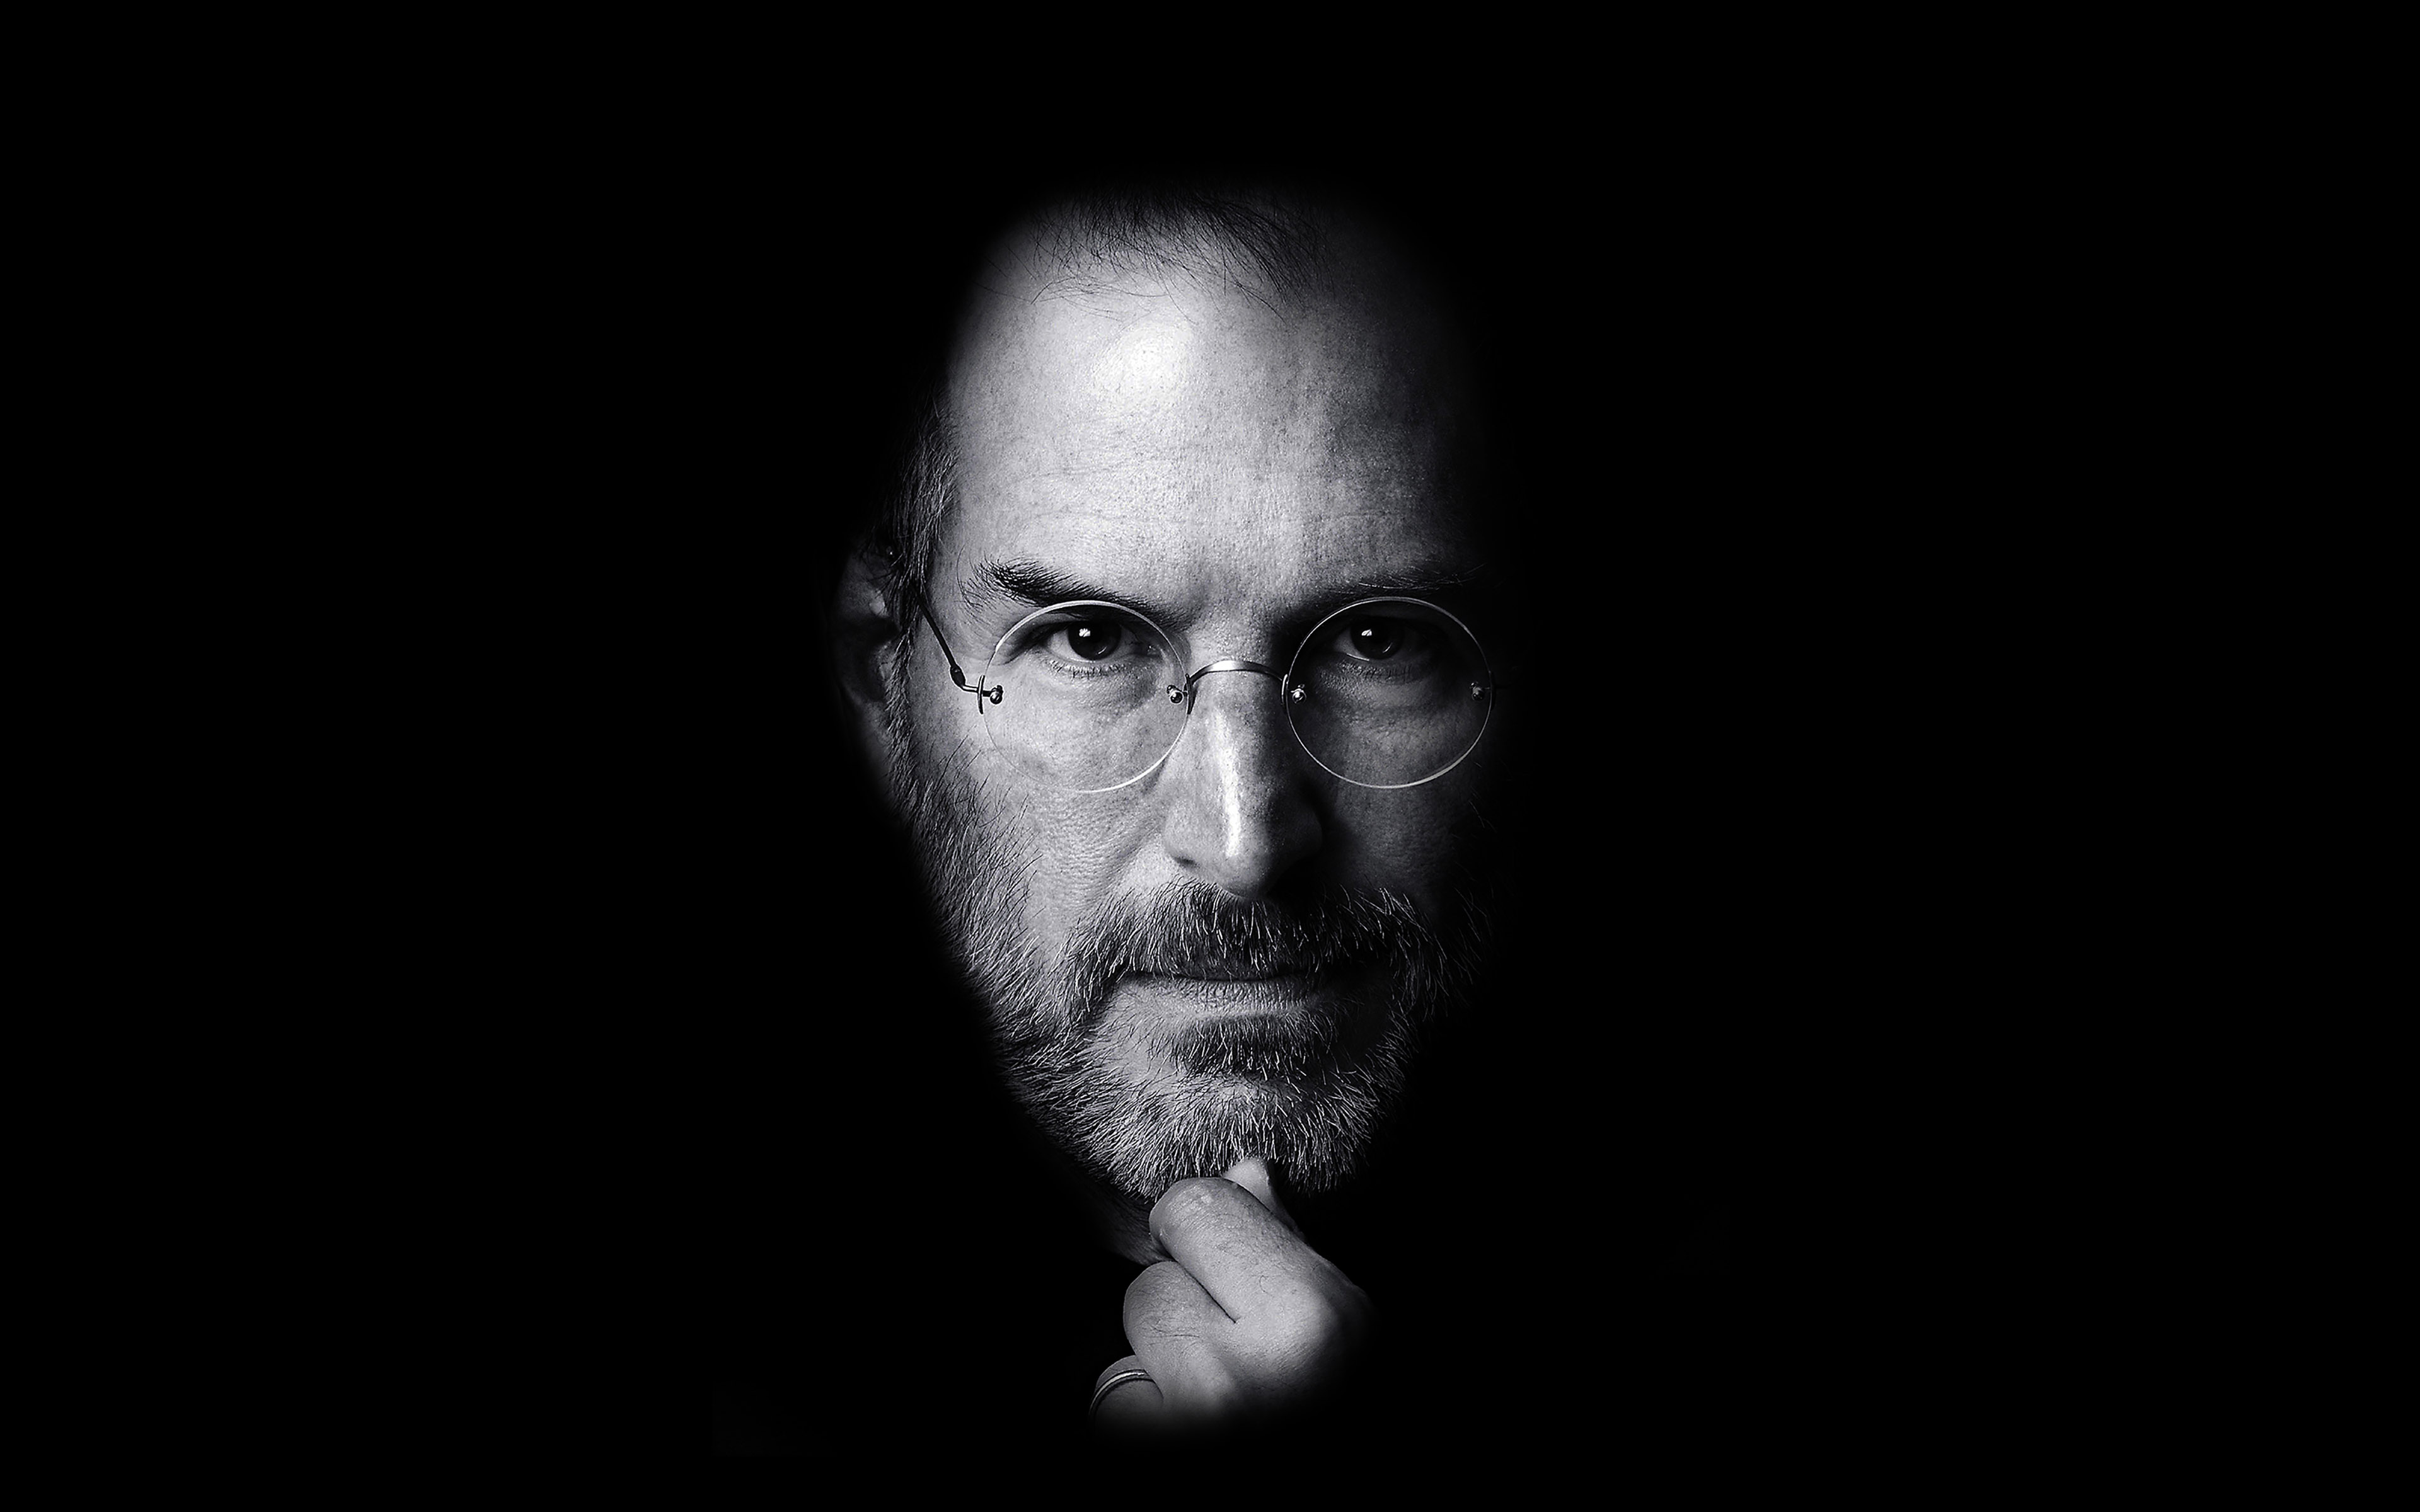 City Fall Desktop Wallpapers Ha87 Wallpaper Steve Jobs Face Apple Papers Co